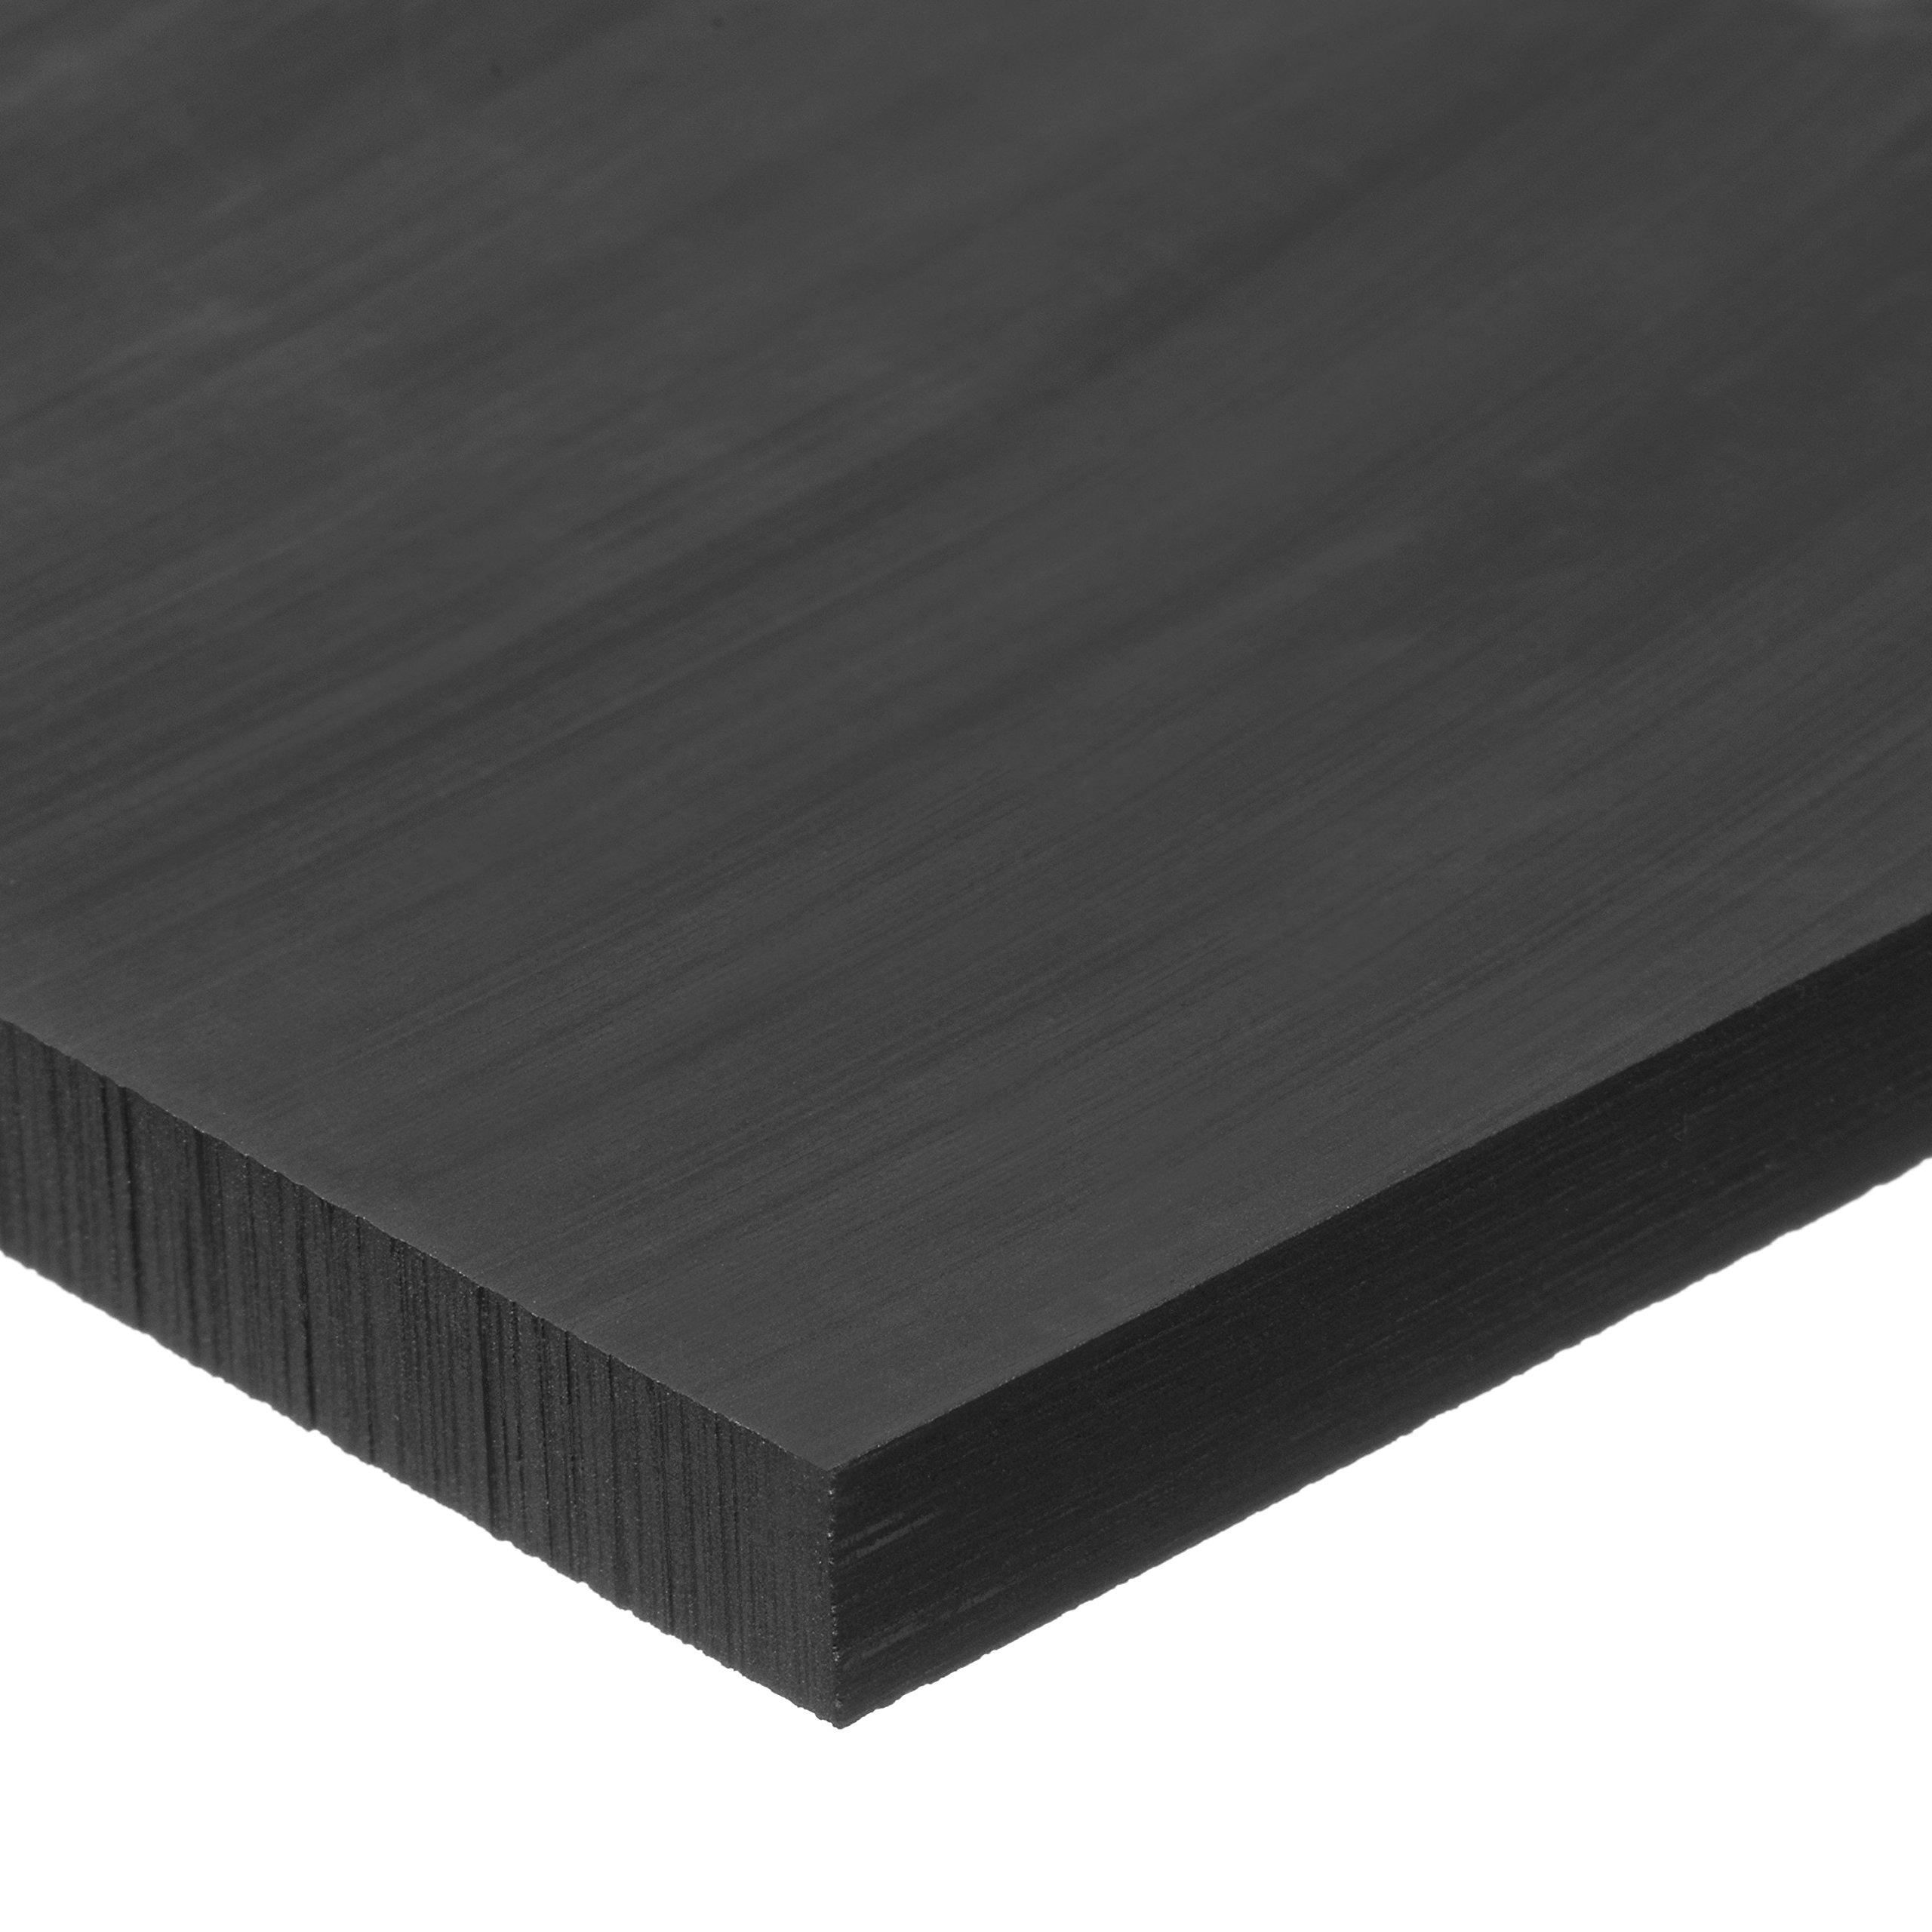 USA Sealing Black Acetal Plastic Bar - 1/2'' Thick x 4'' Wide x 24'' Long by USA Sealing